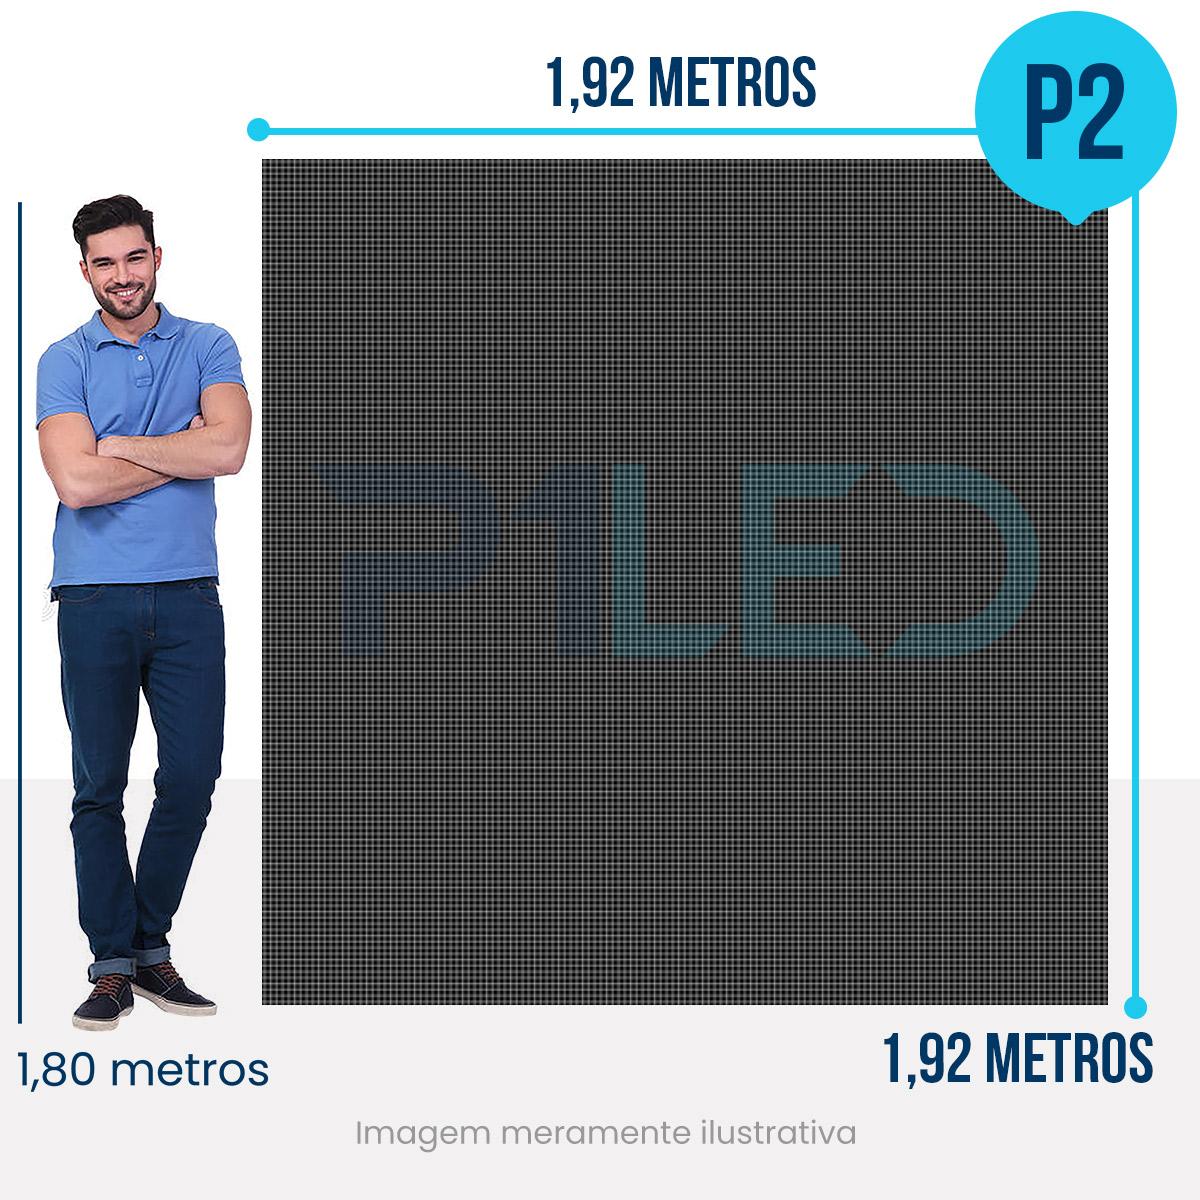 Painel de LED para Padaria 1,92 x 1,92  - Telão P2.5 Indoor  - Painel e Telão de LED - O Melhor Preço em Painel de LED | P1LED